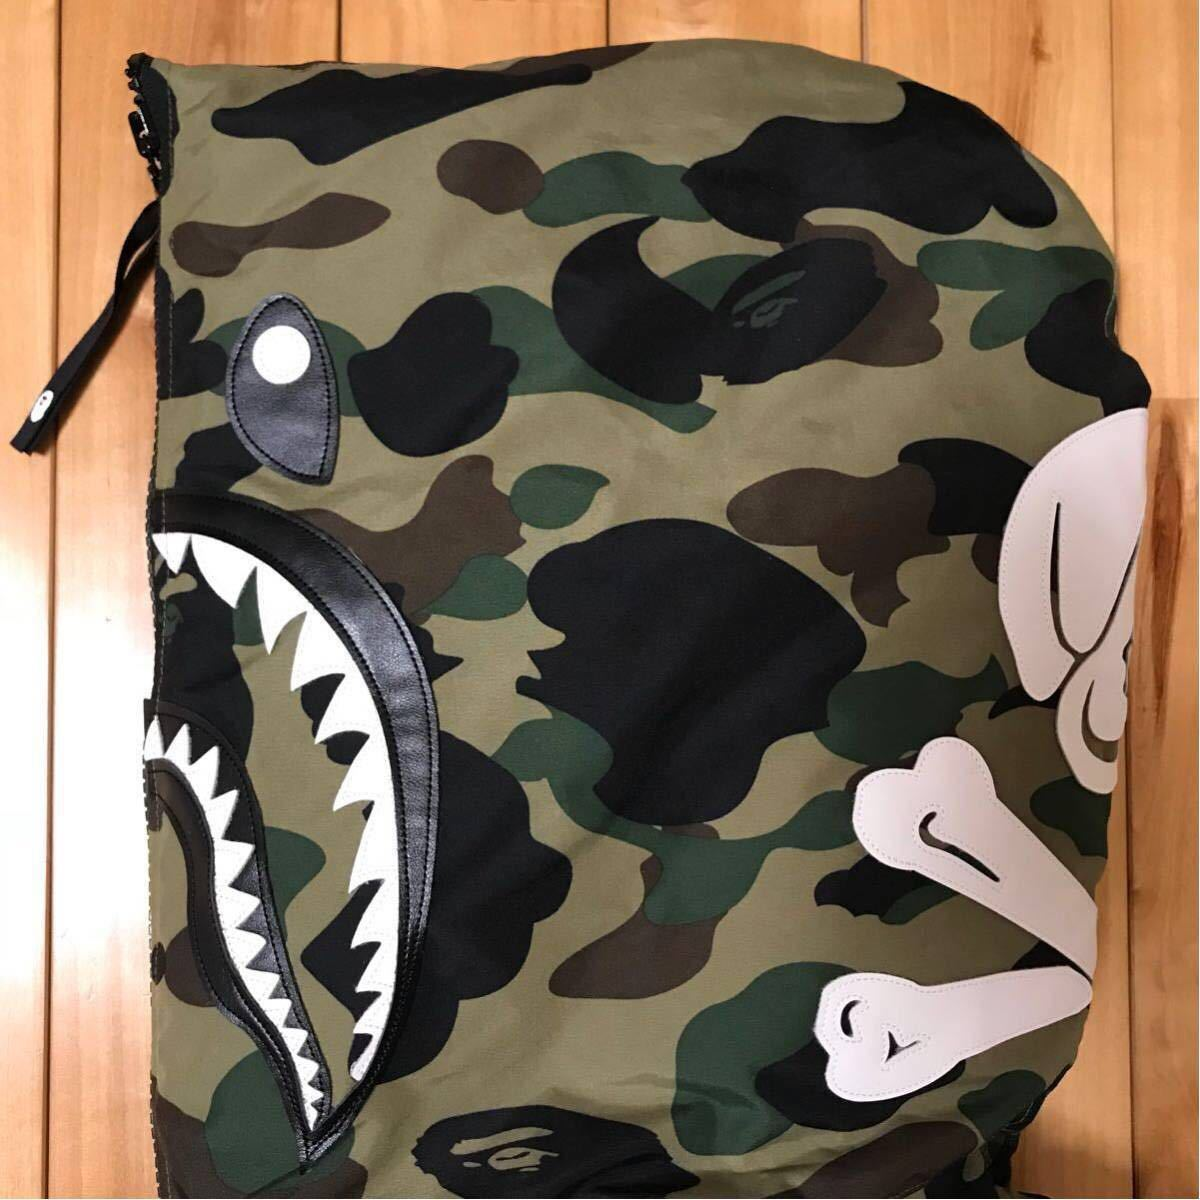 ★2XL★ 原宿限定 NBHD CAMO SHARK N2-B ダウンジャケット bape hoodie シャーク パーカー a bathing ape ネイバーフッド NEIGHBORHOOD XXL